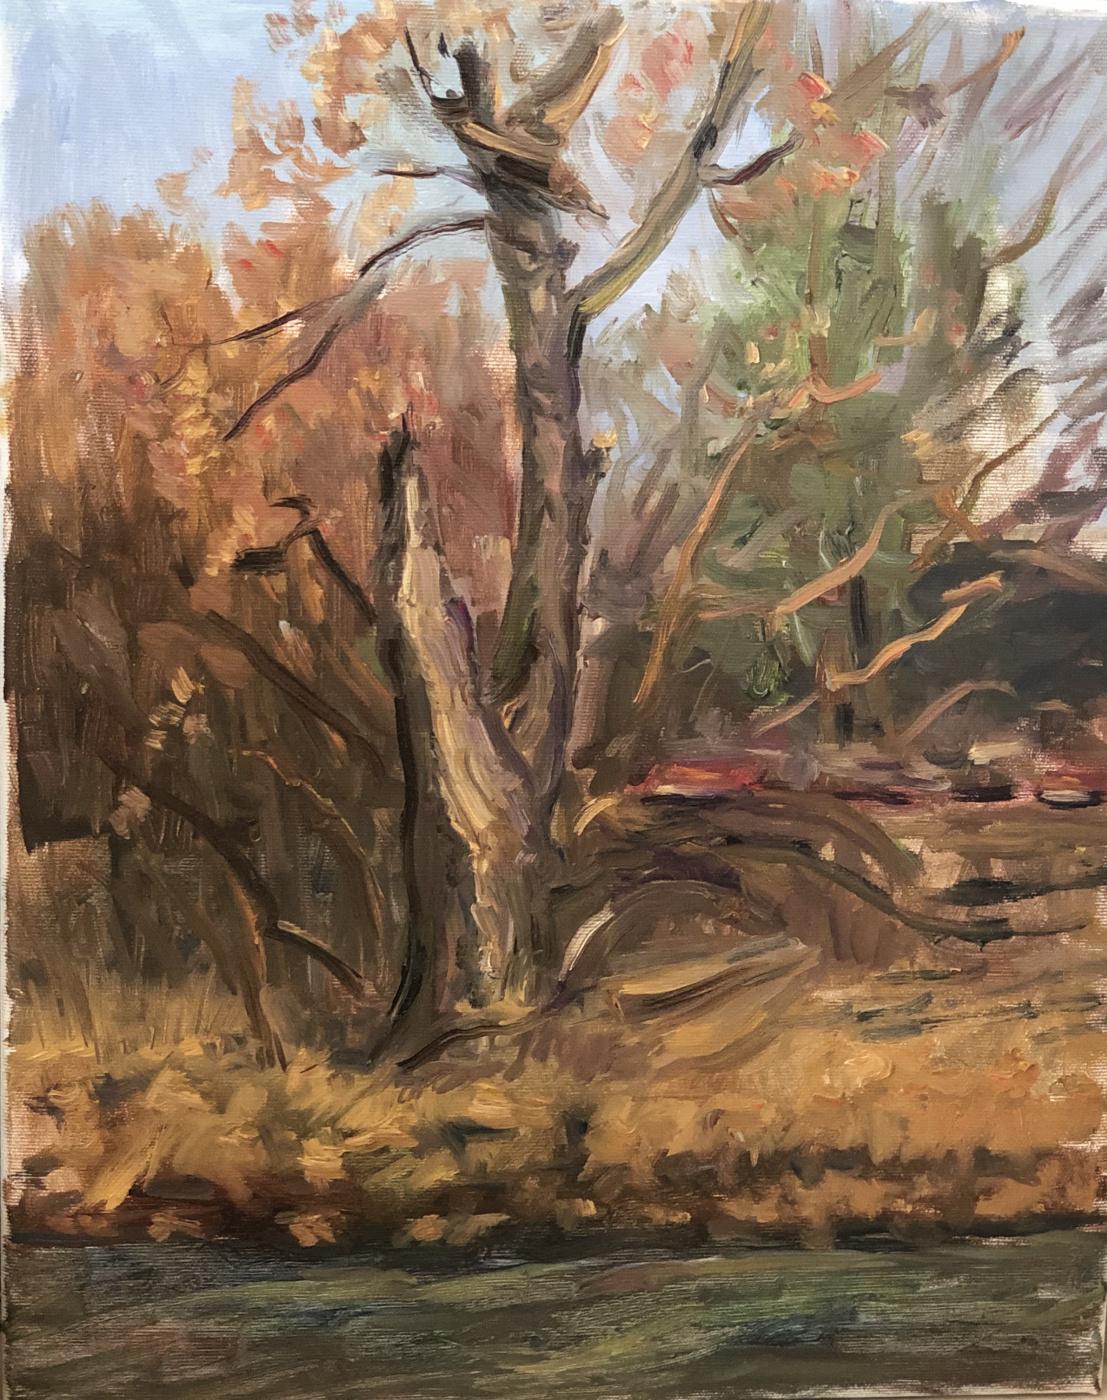 Victoria Marshakova. Broken tree by the river.